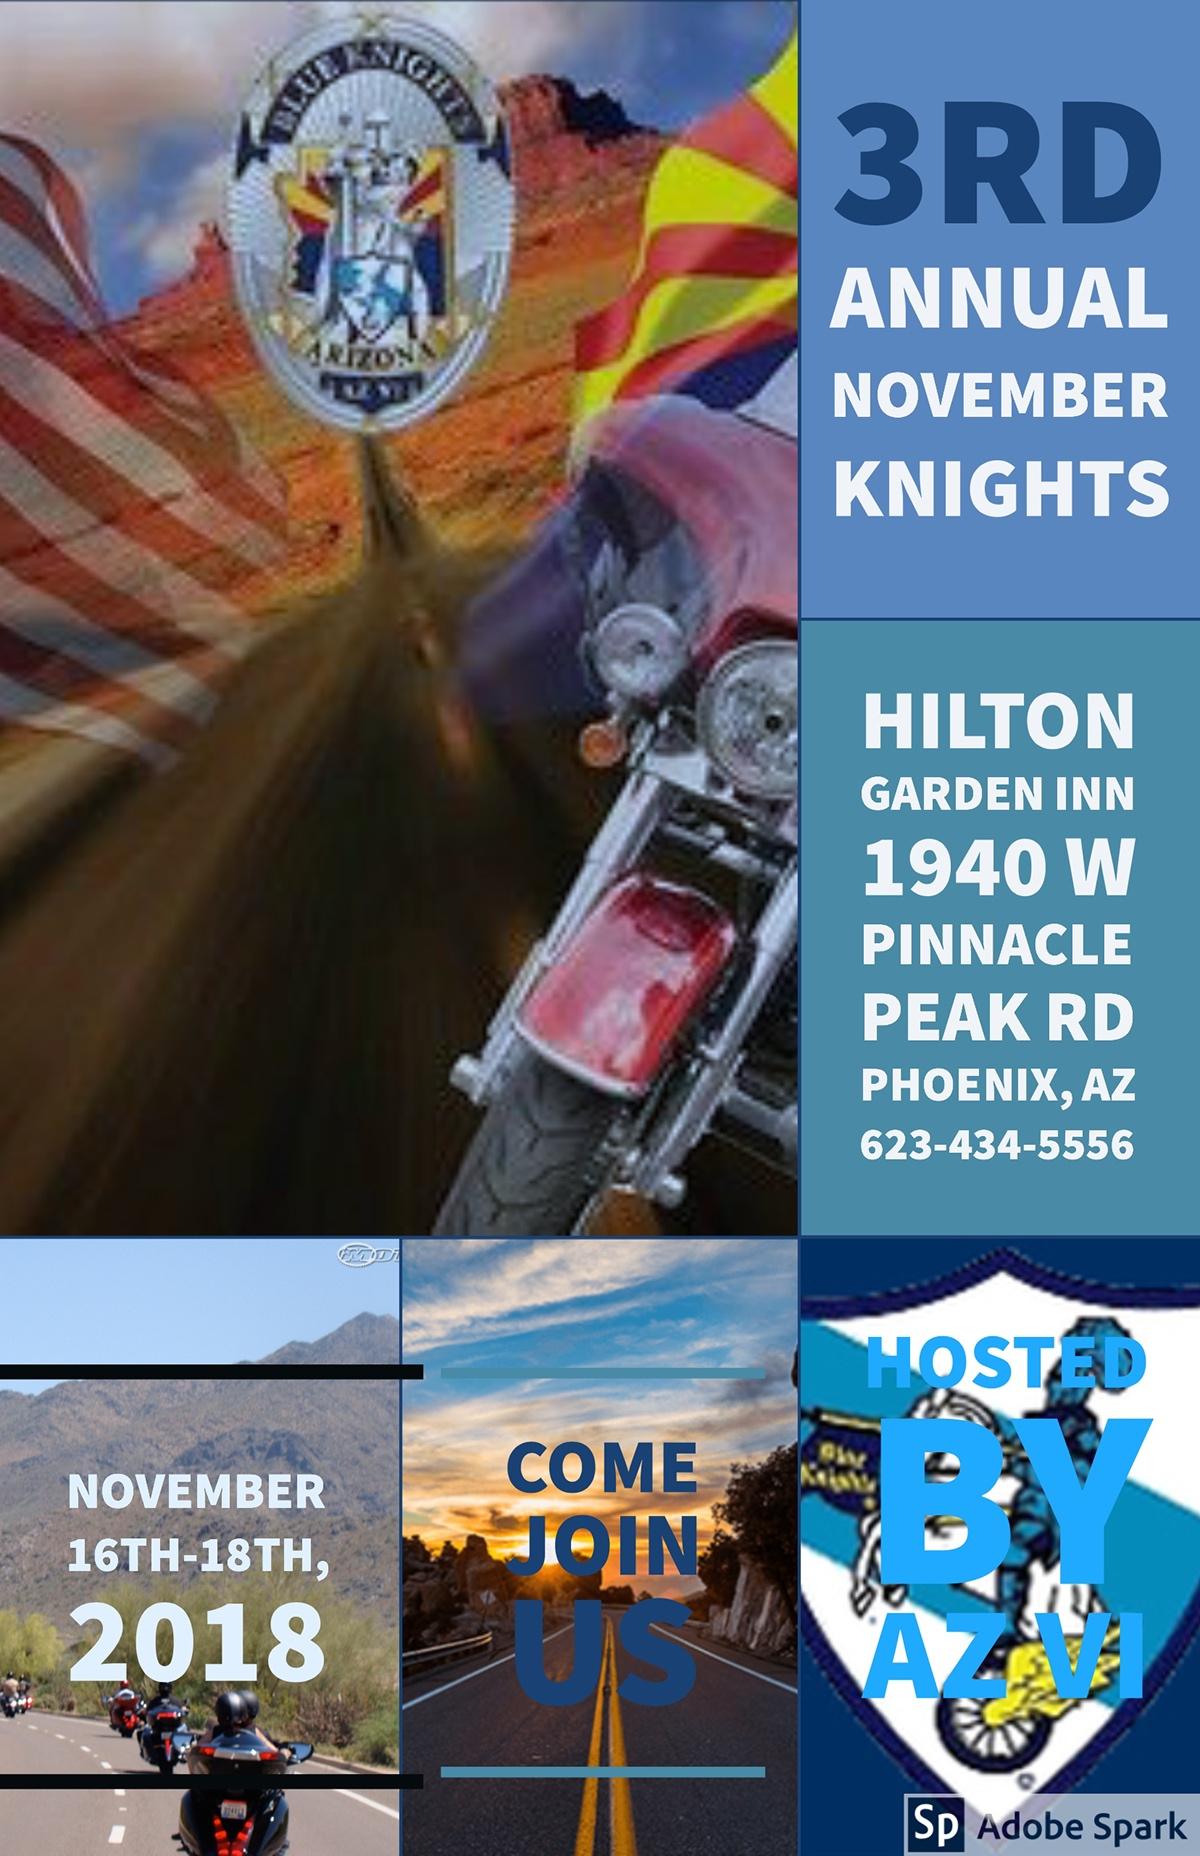 hosted by AZ VI hosted by AZ VI<P>3rd Annual November Knights<P>COME JOIN US<P>November 16th-18th, 2018<P>Hilton Garden Inn<BR>1940 W Pinnacle Peak Rd<BR>Phoenix, AZ                623-434-5556